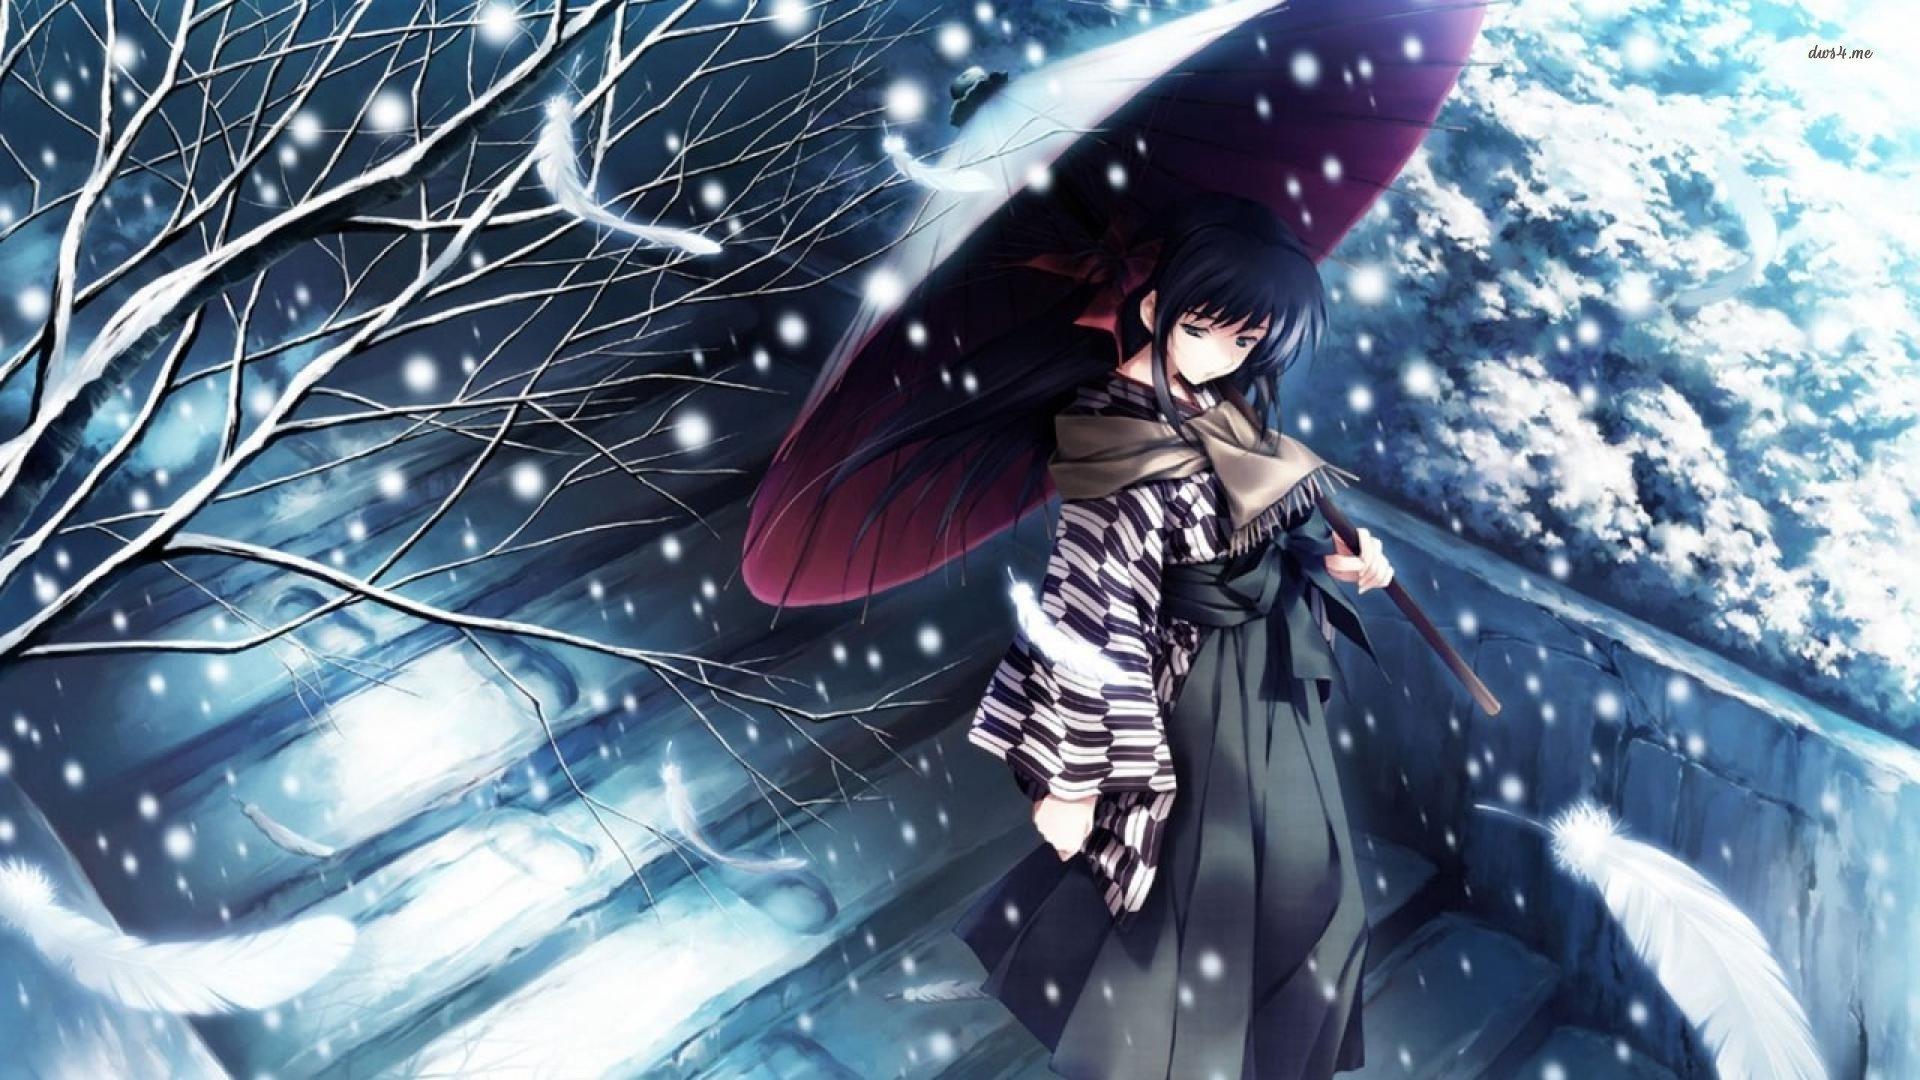 snow Tree Kimono Girl Alone Sad Anime Blue Wallpapers HD 1920x1080